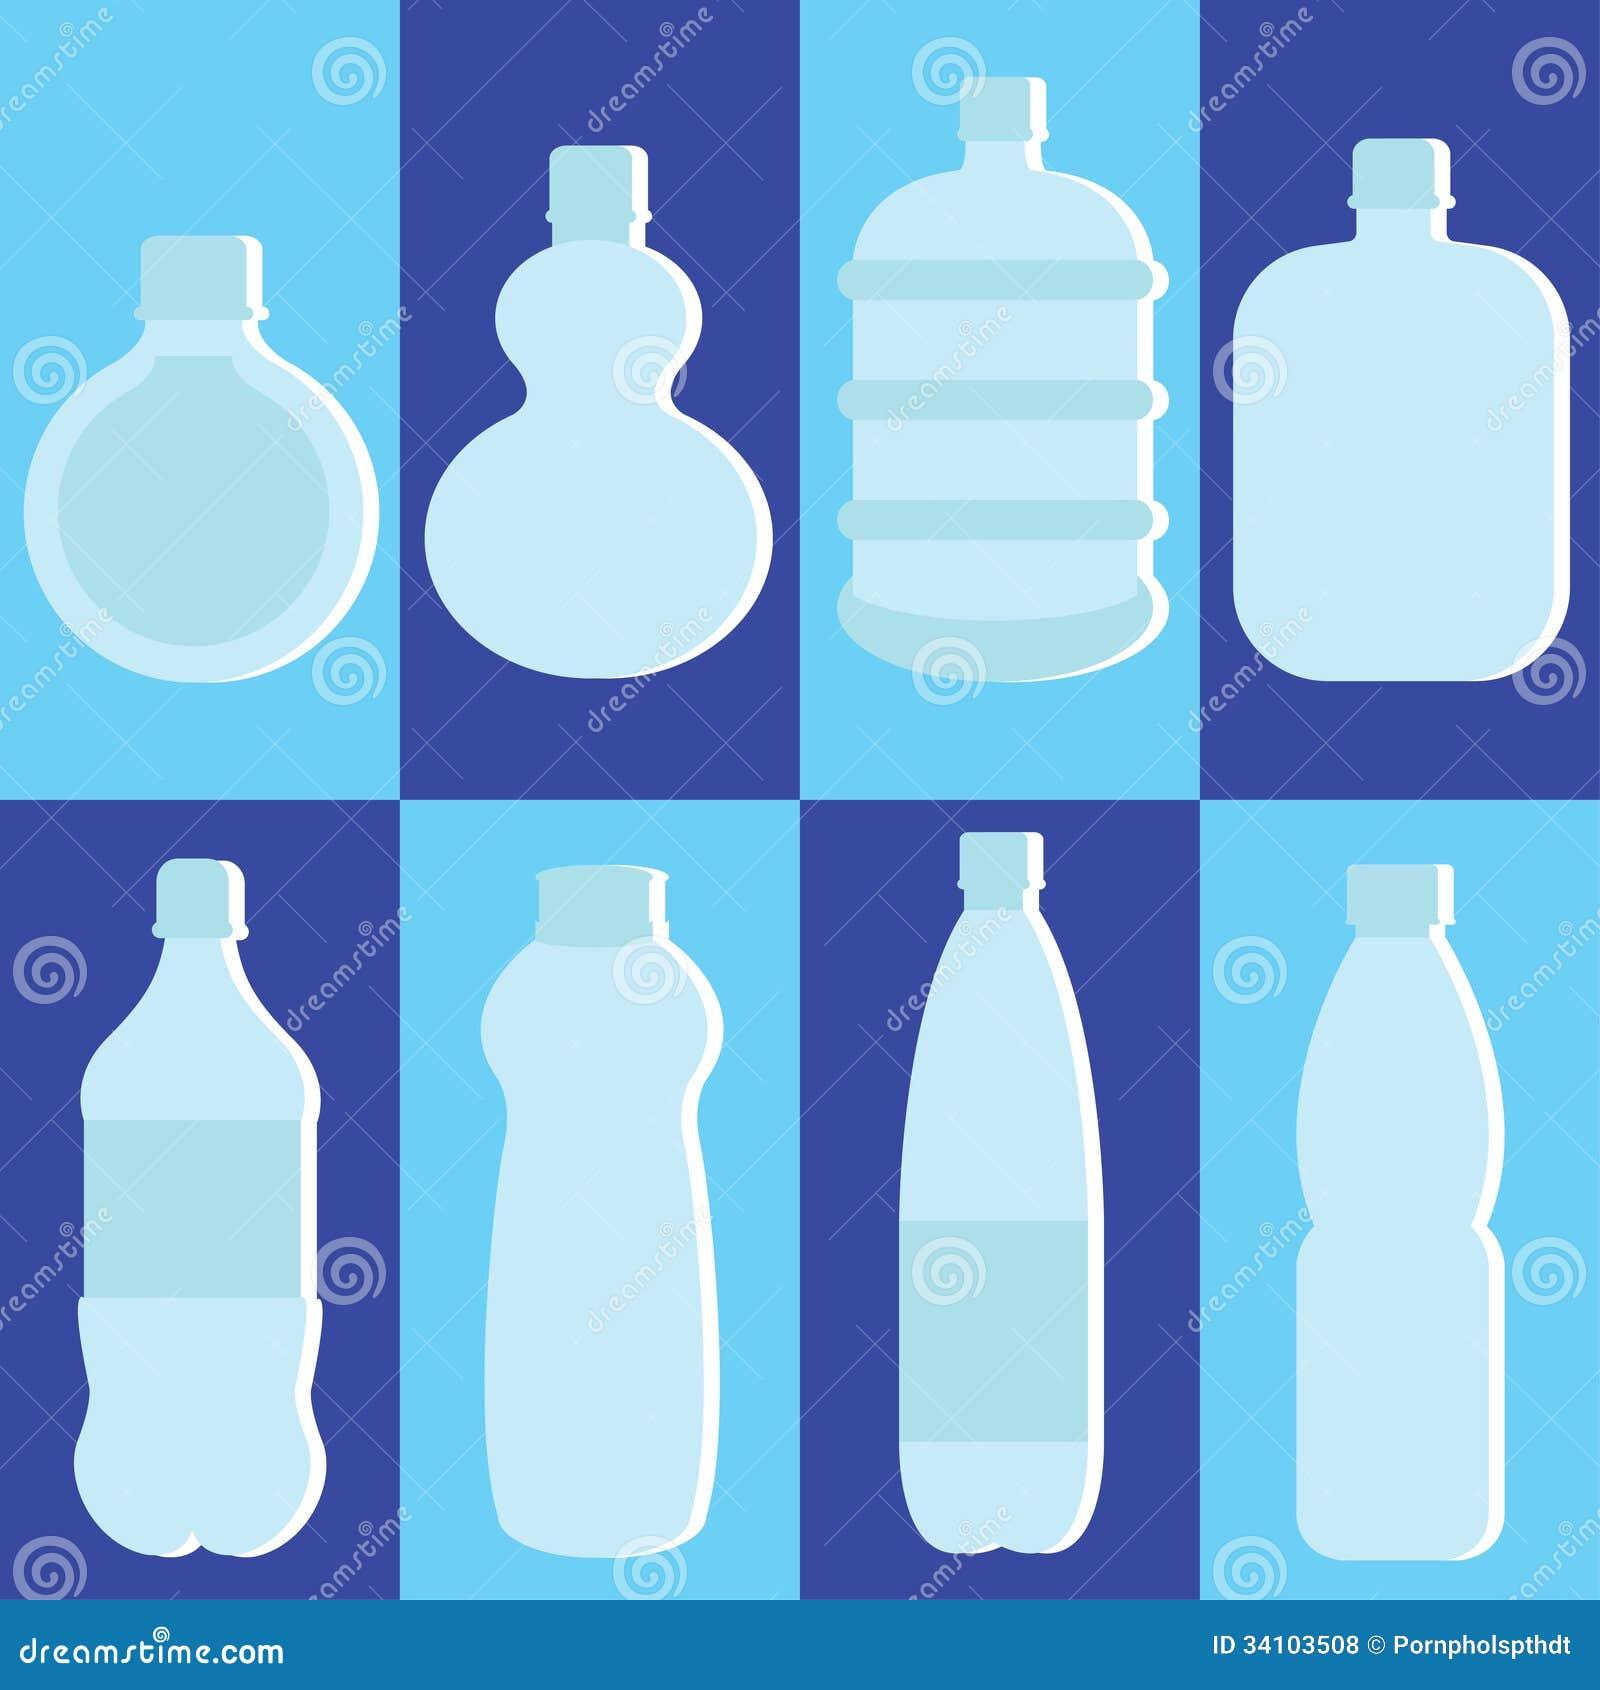 Water Bottle Vector: Vector Set Of Water Bottle Stock Vector. Illustration Of